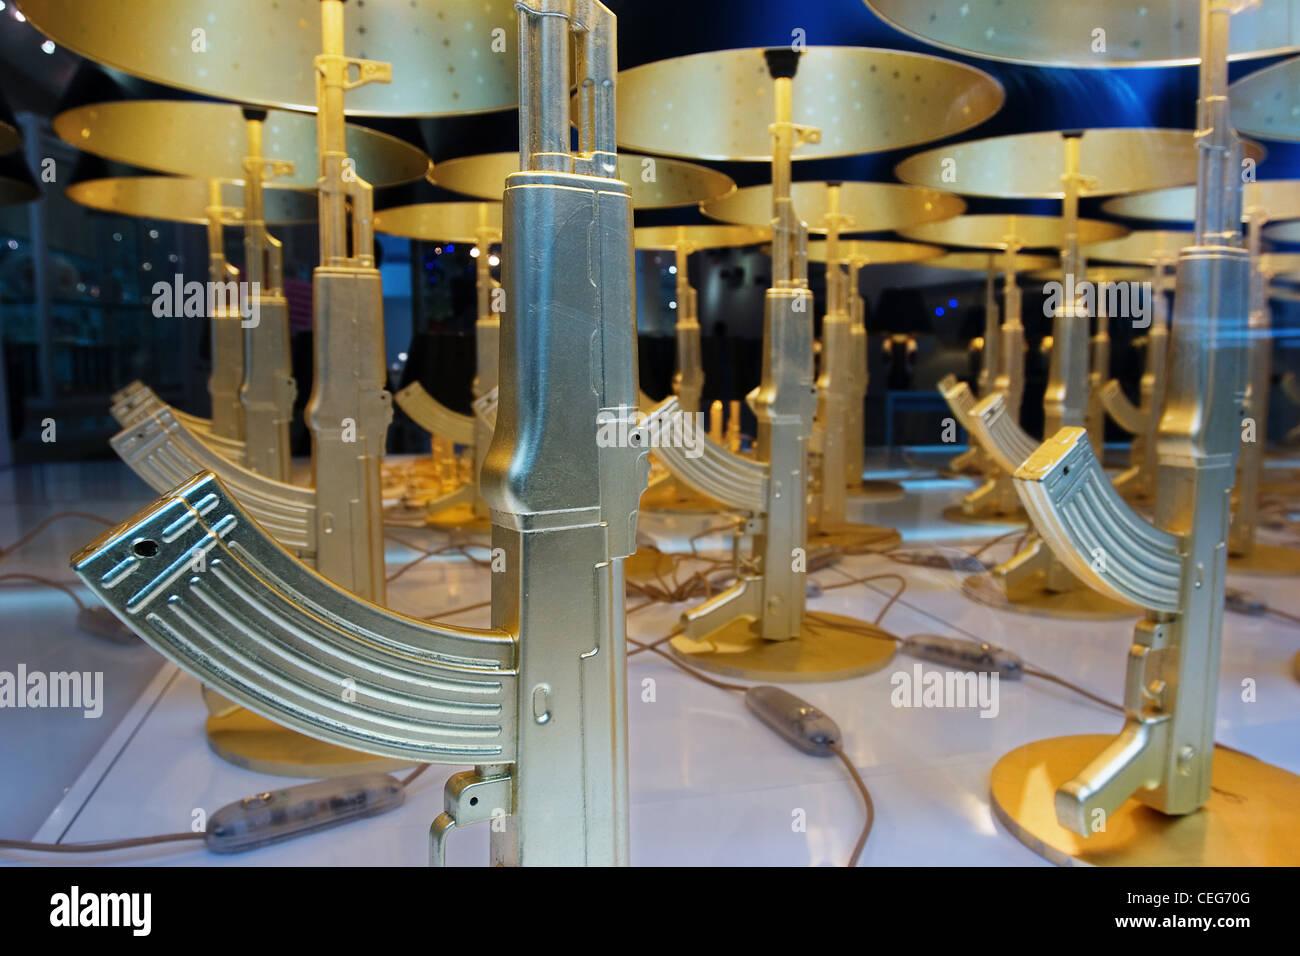 Kalashnikov-themed lamps, Soho New York City - Stock Image